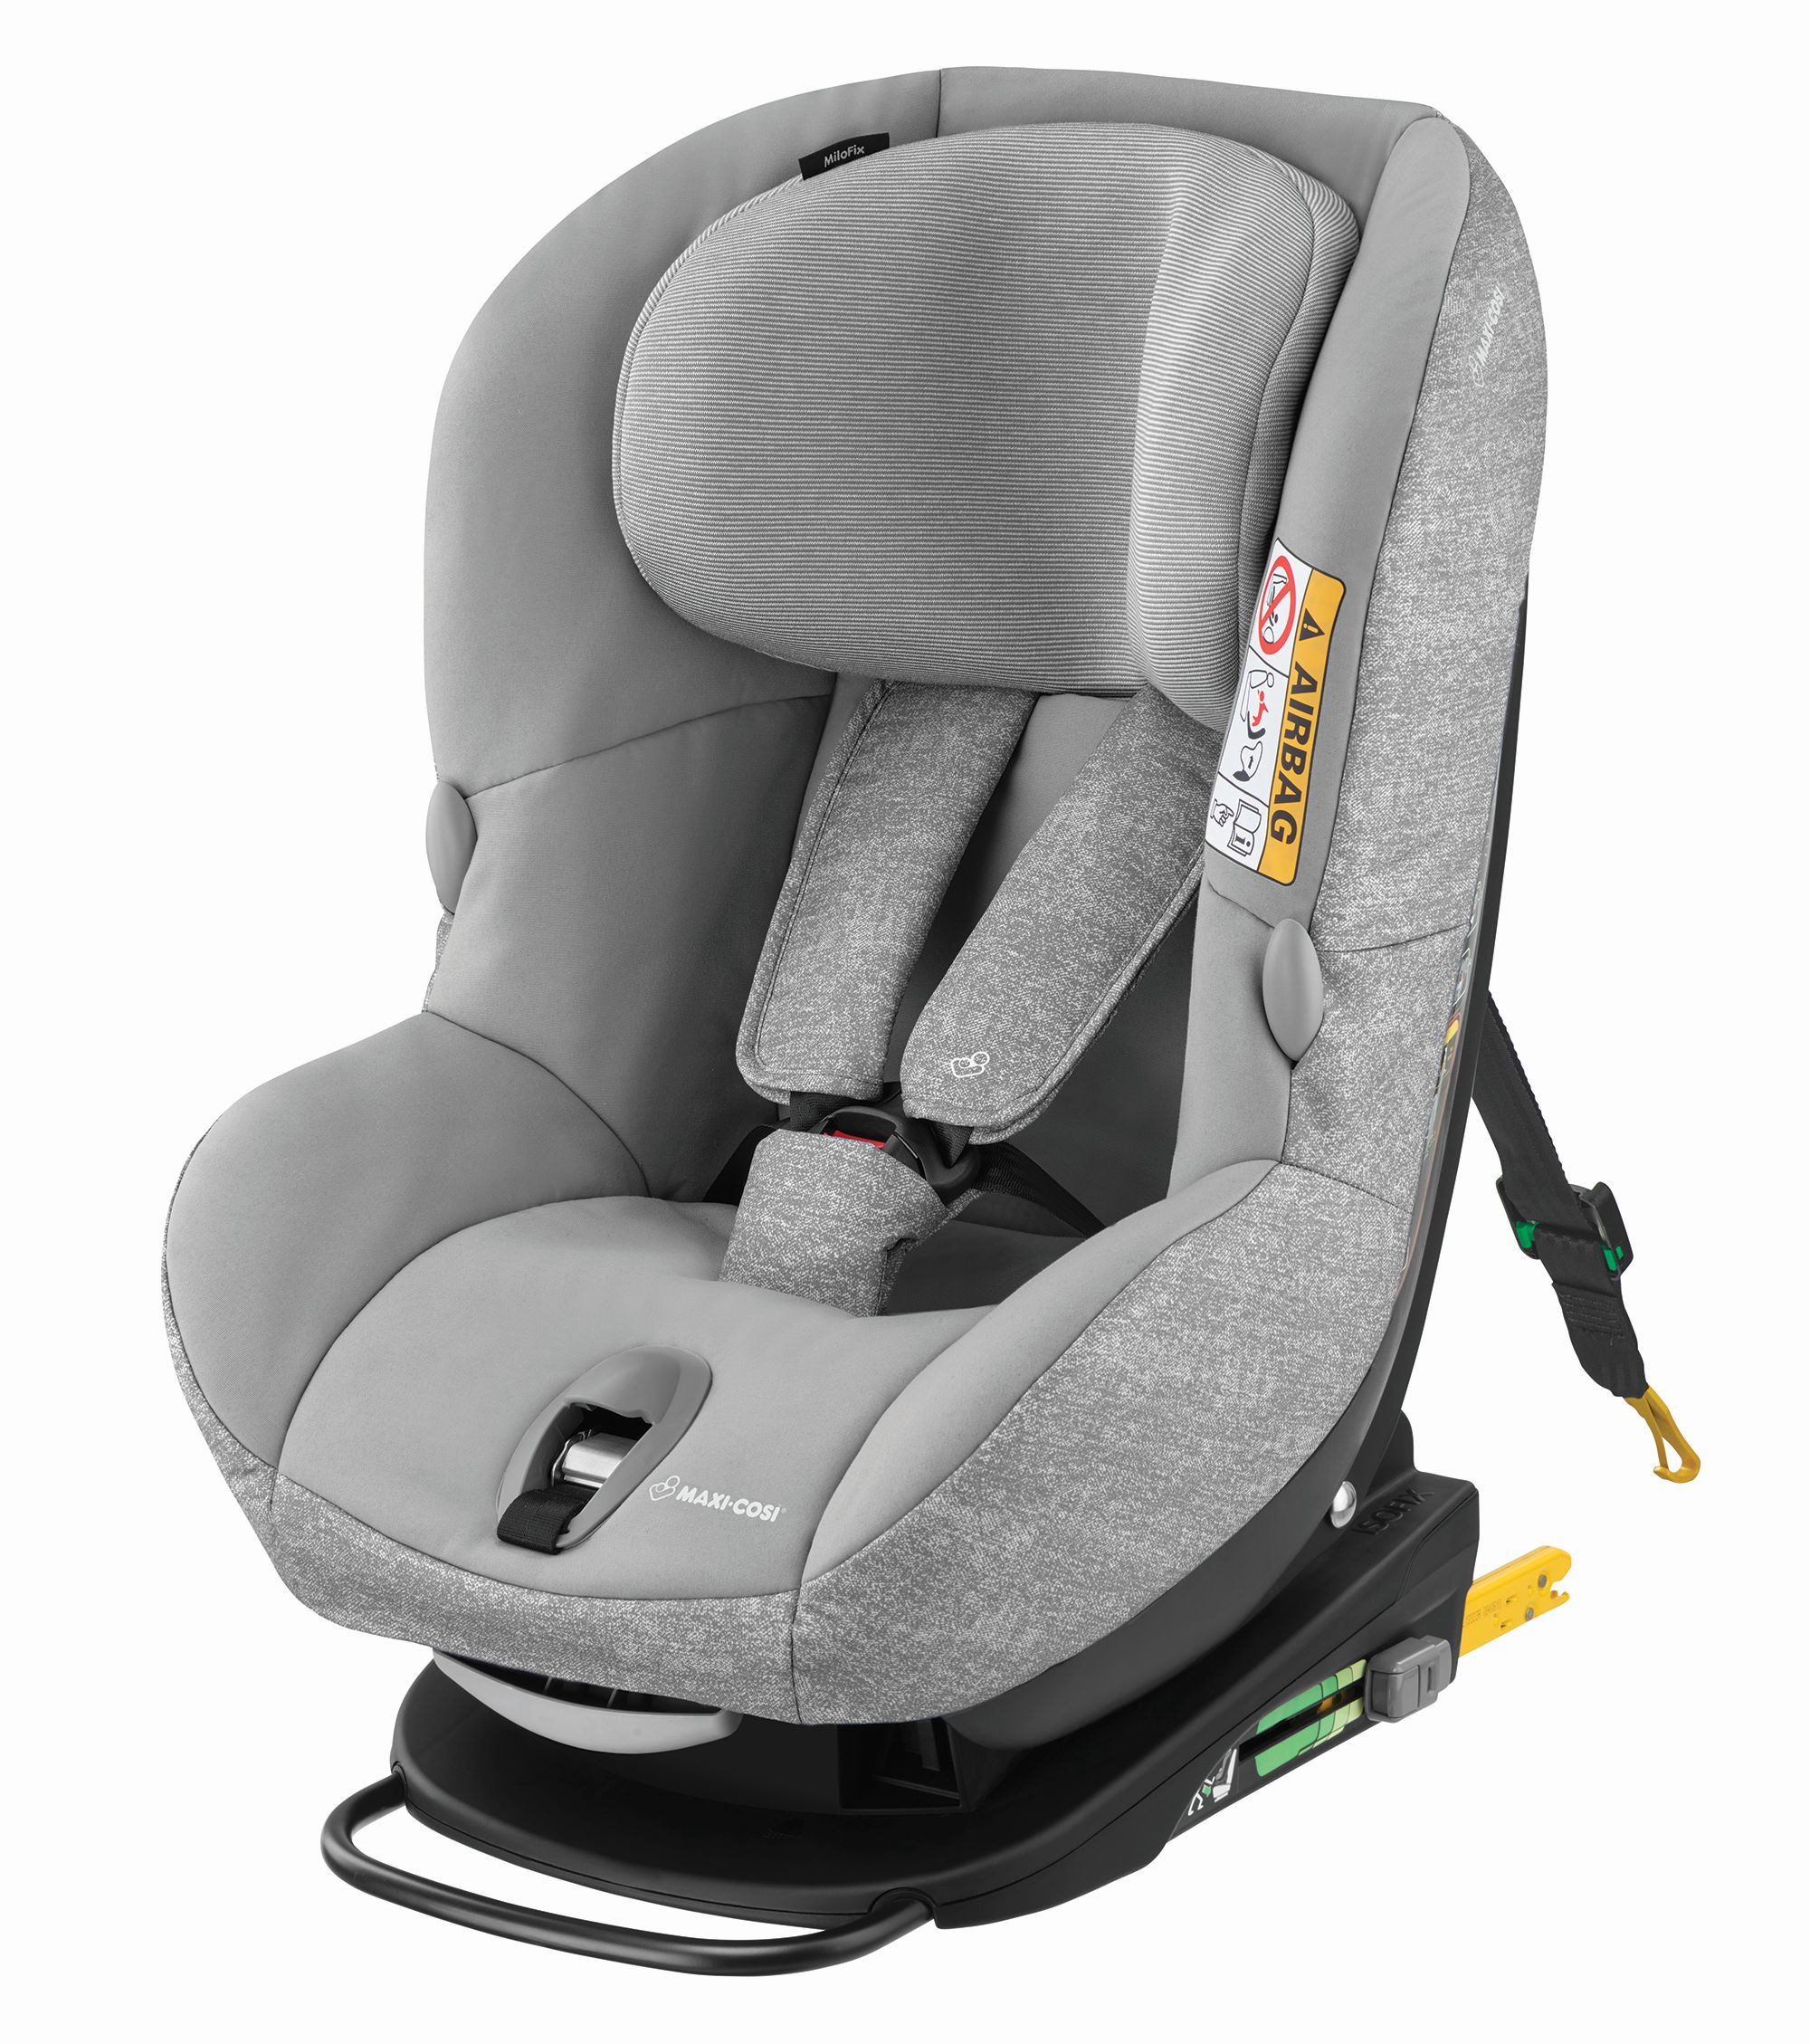 Maxi Cosi Child Car Seat Milofix